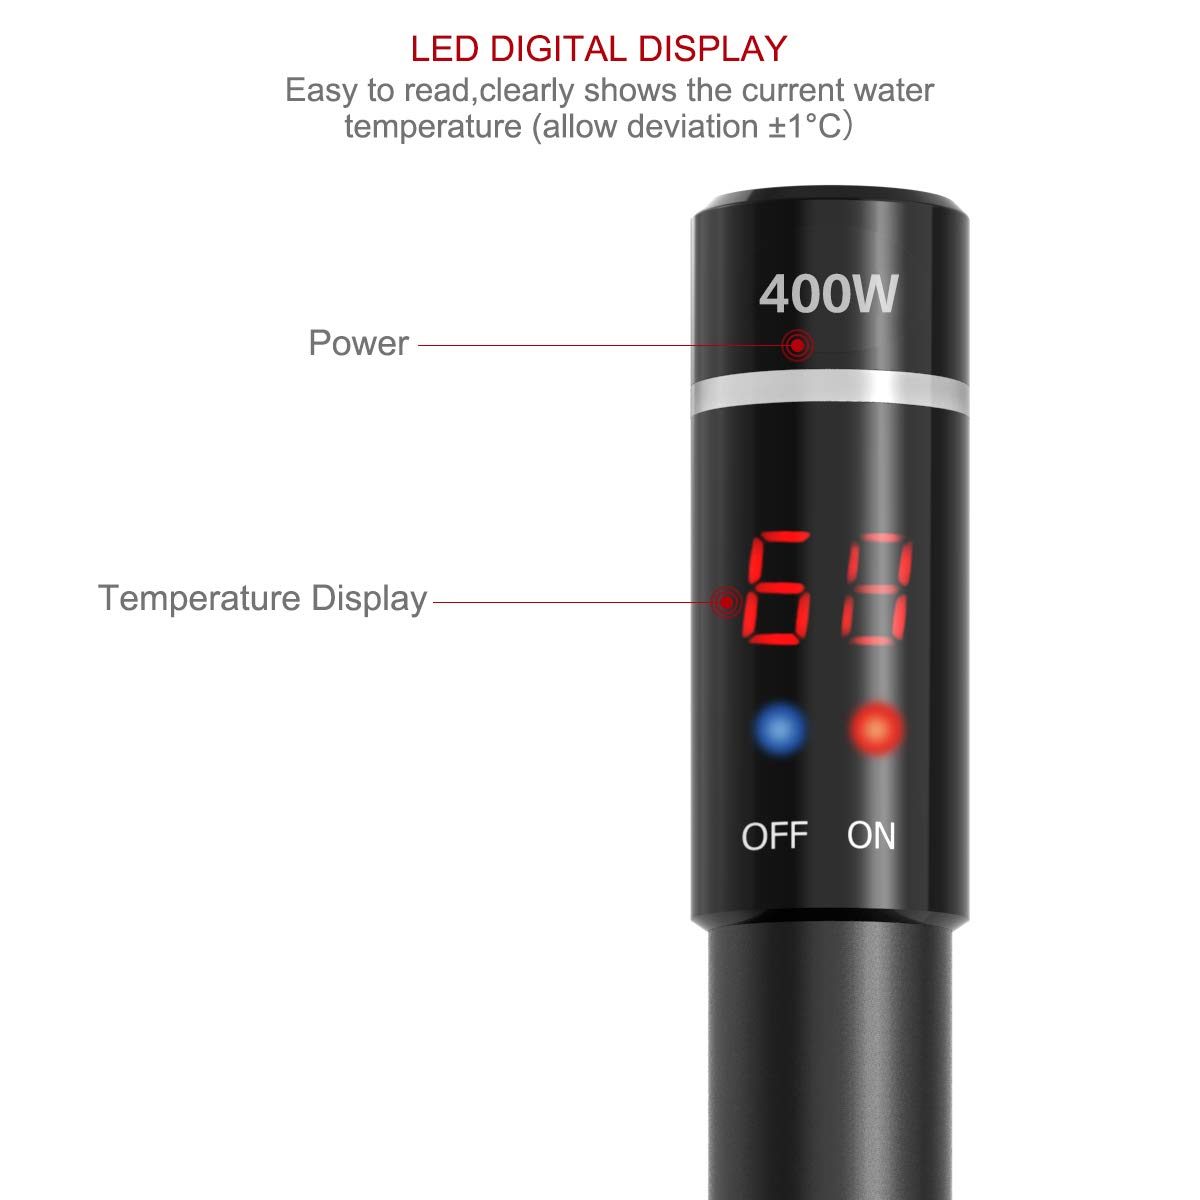 UEETEK Aquarium Heater 400W, Submersible Titanium Fish Tank Heaters Thermostat with Intelligent LED Temperature Display by UEETEK (Image #2)